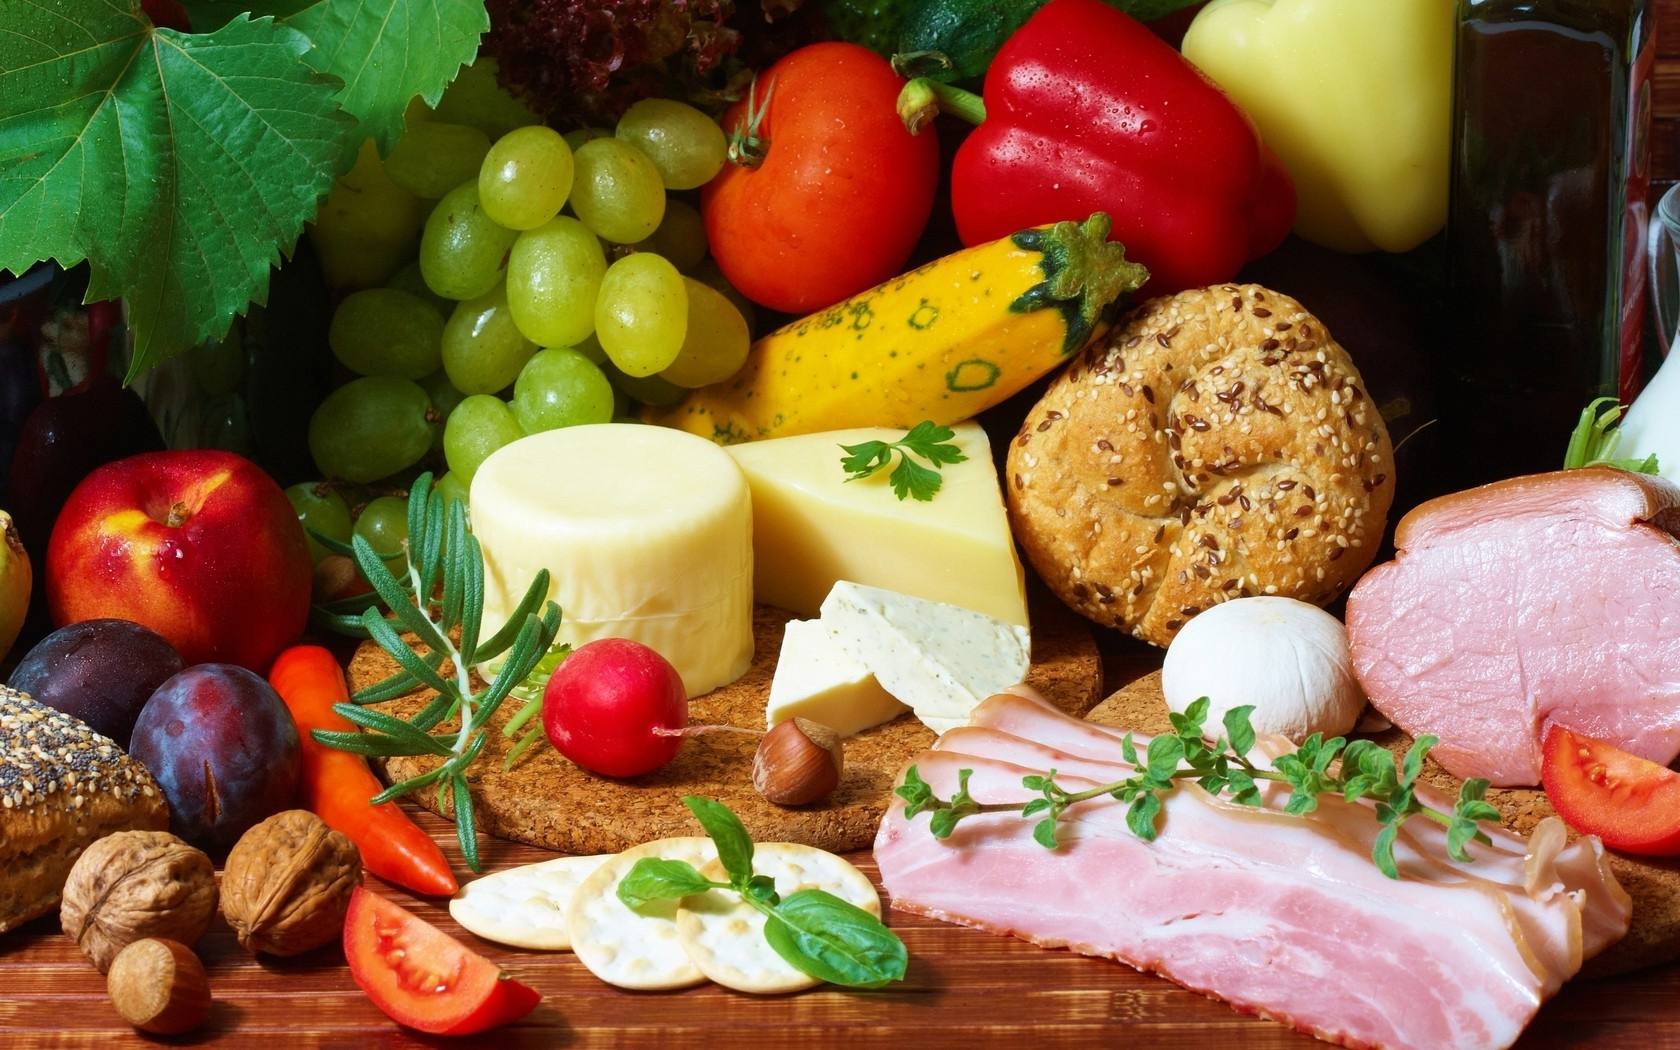 Foods for O Negative Blood